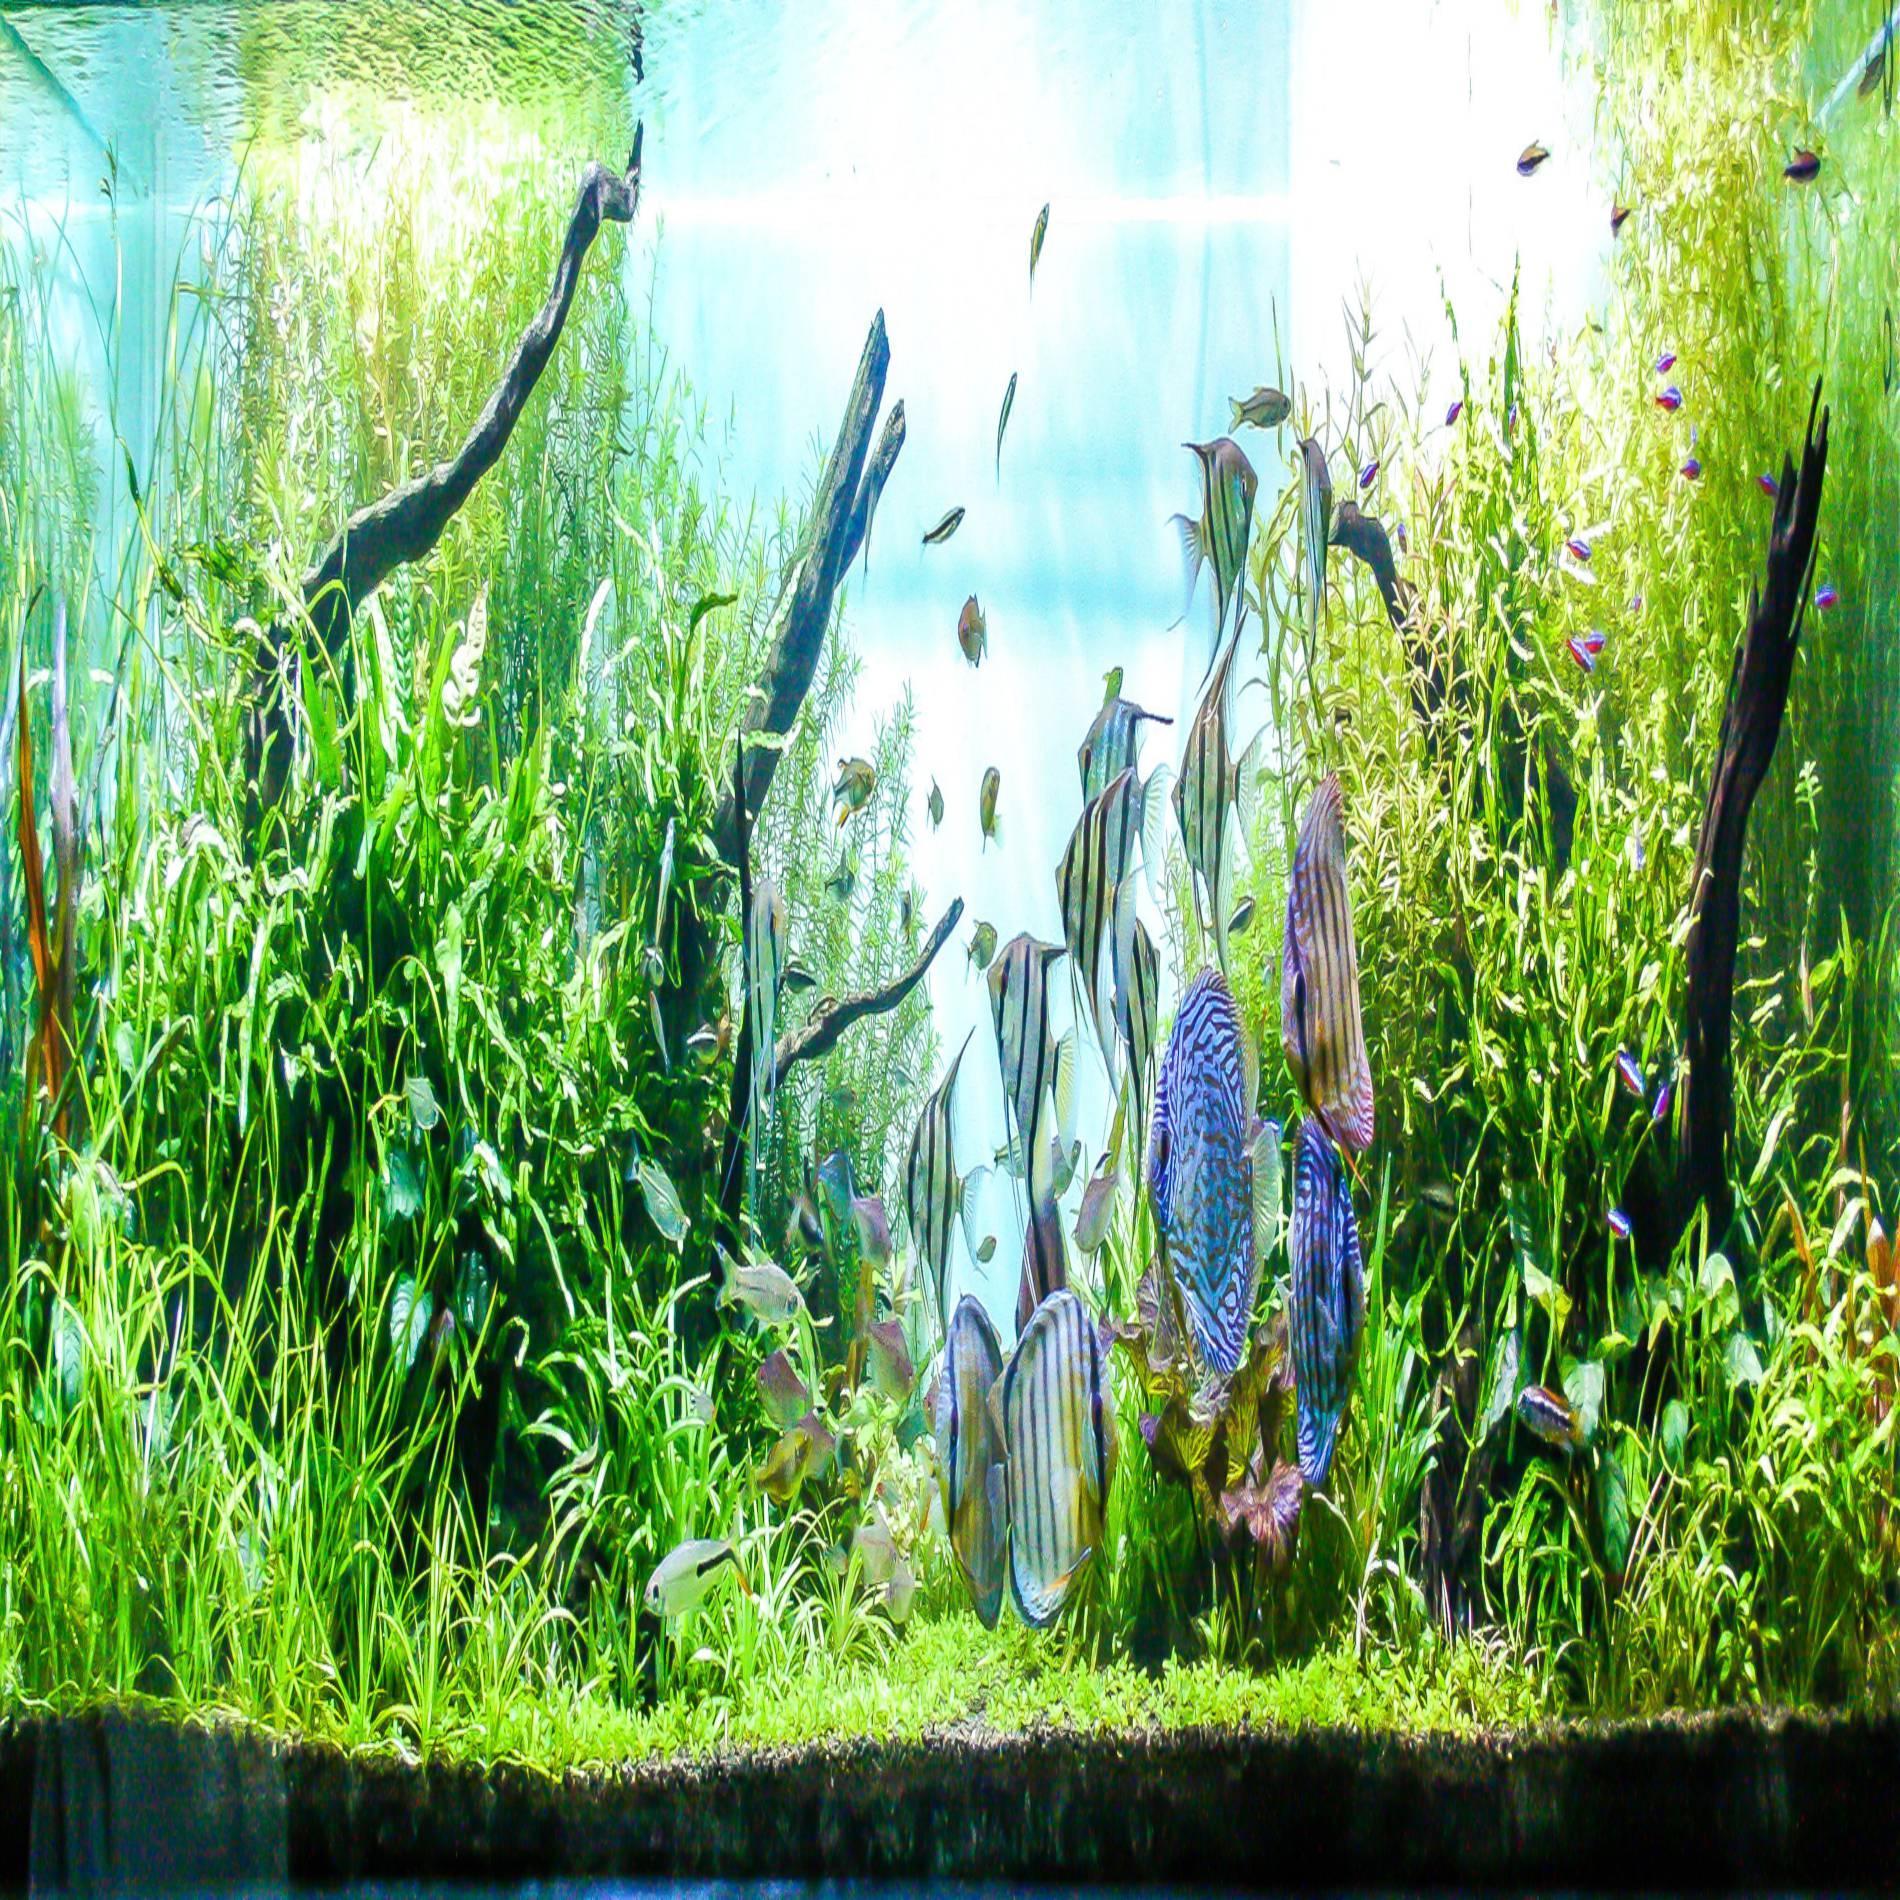 water grass style aquarium fish tank poster thicken pvc adhesive background sticker wallpaper poster aquarium backdrop decor buy aquarium background